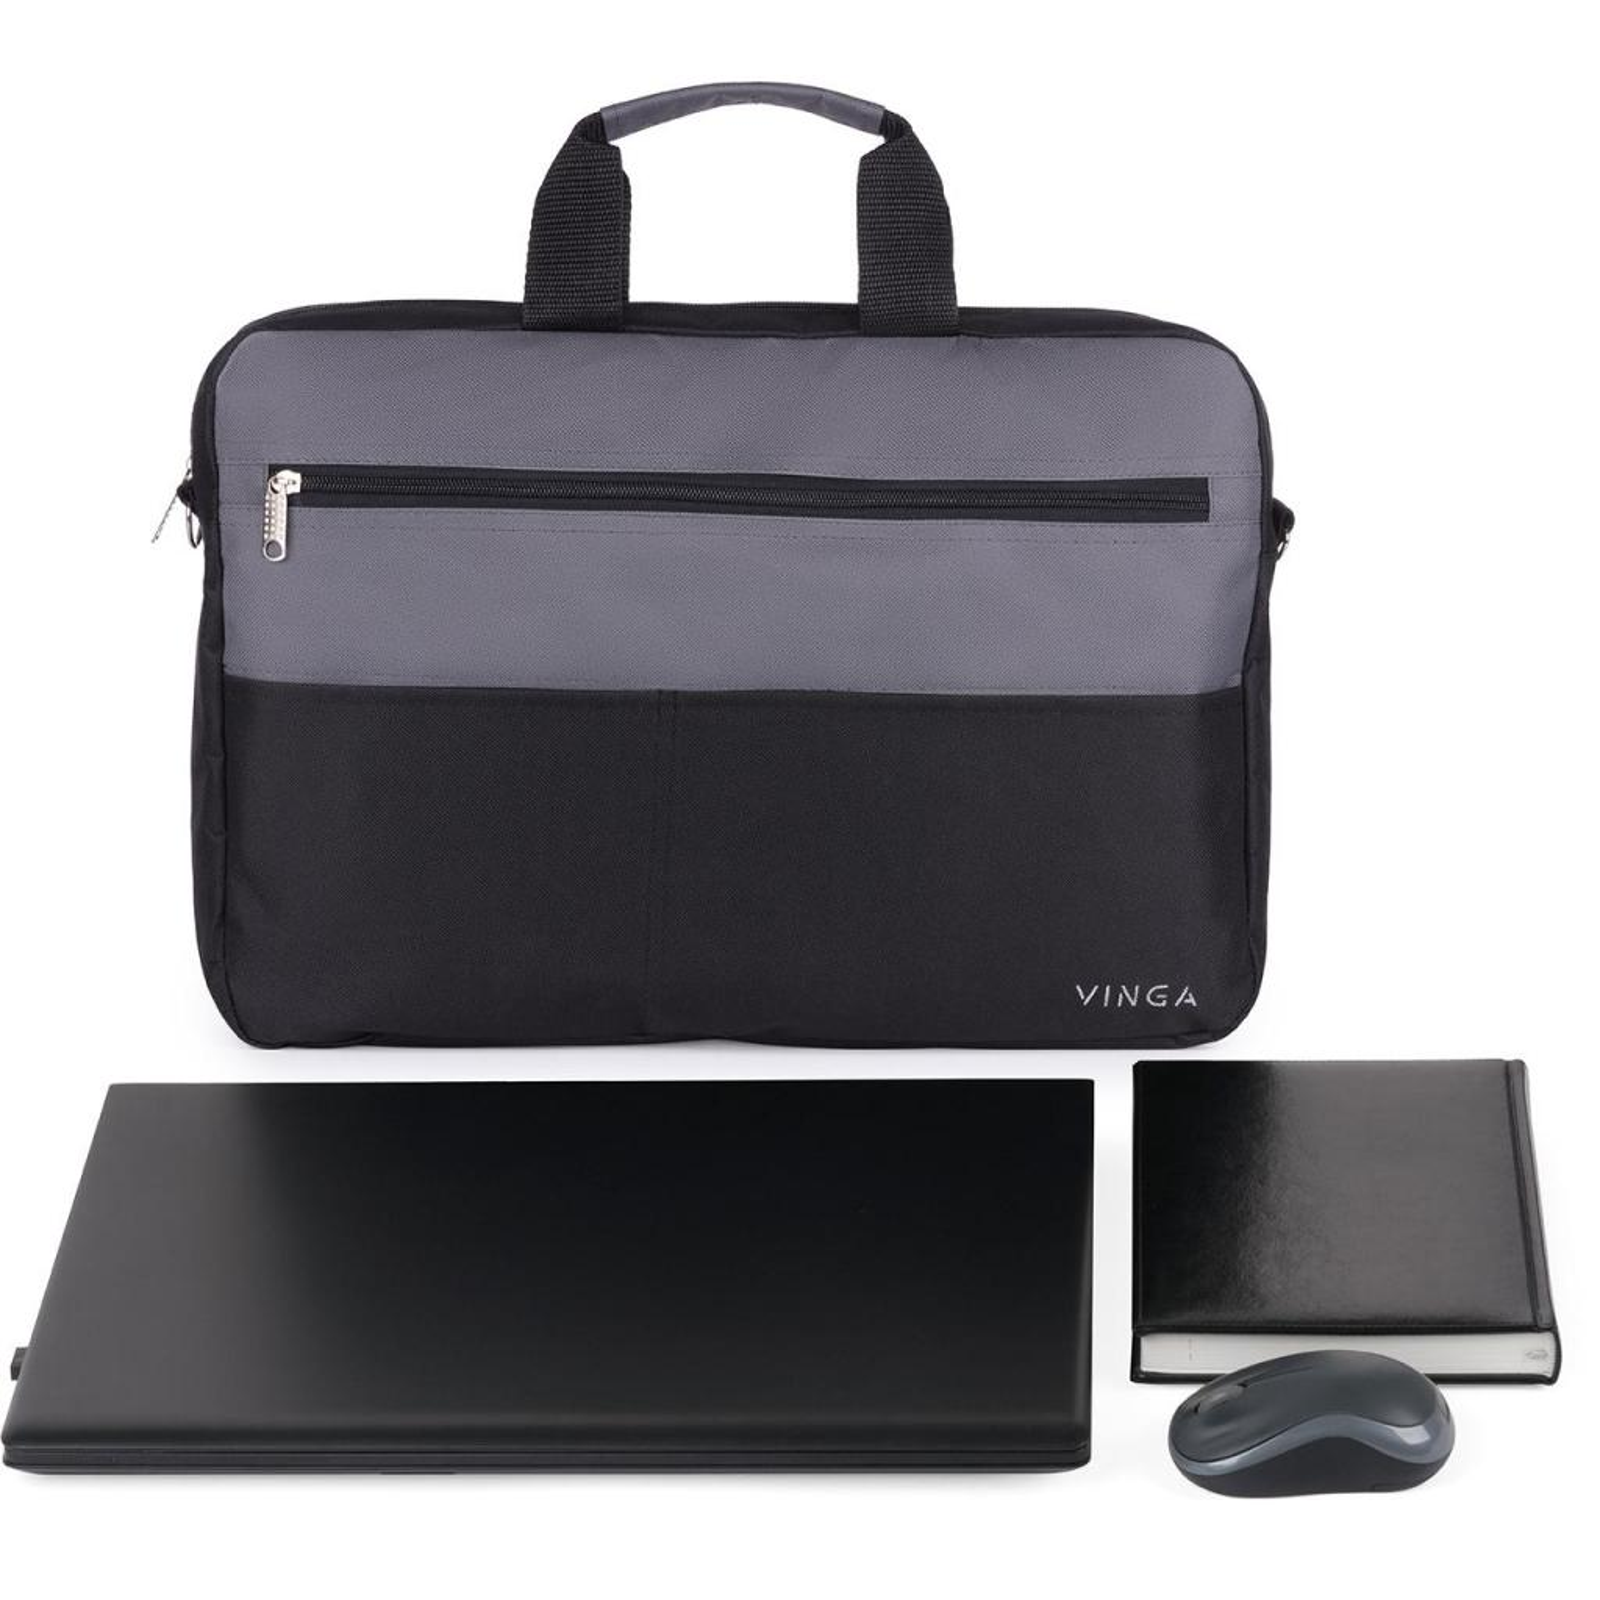 "Сумка для ноутбука Vinga 15.6"" NB177GB gray-black (NB177GB) изображение 2"